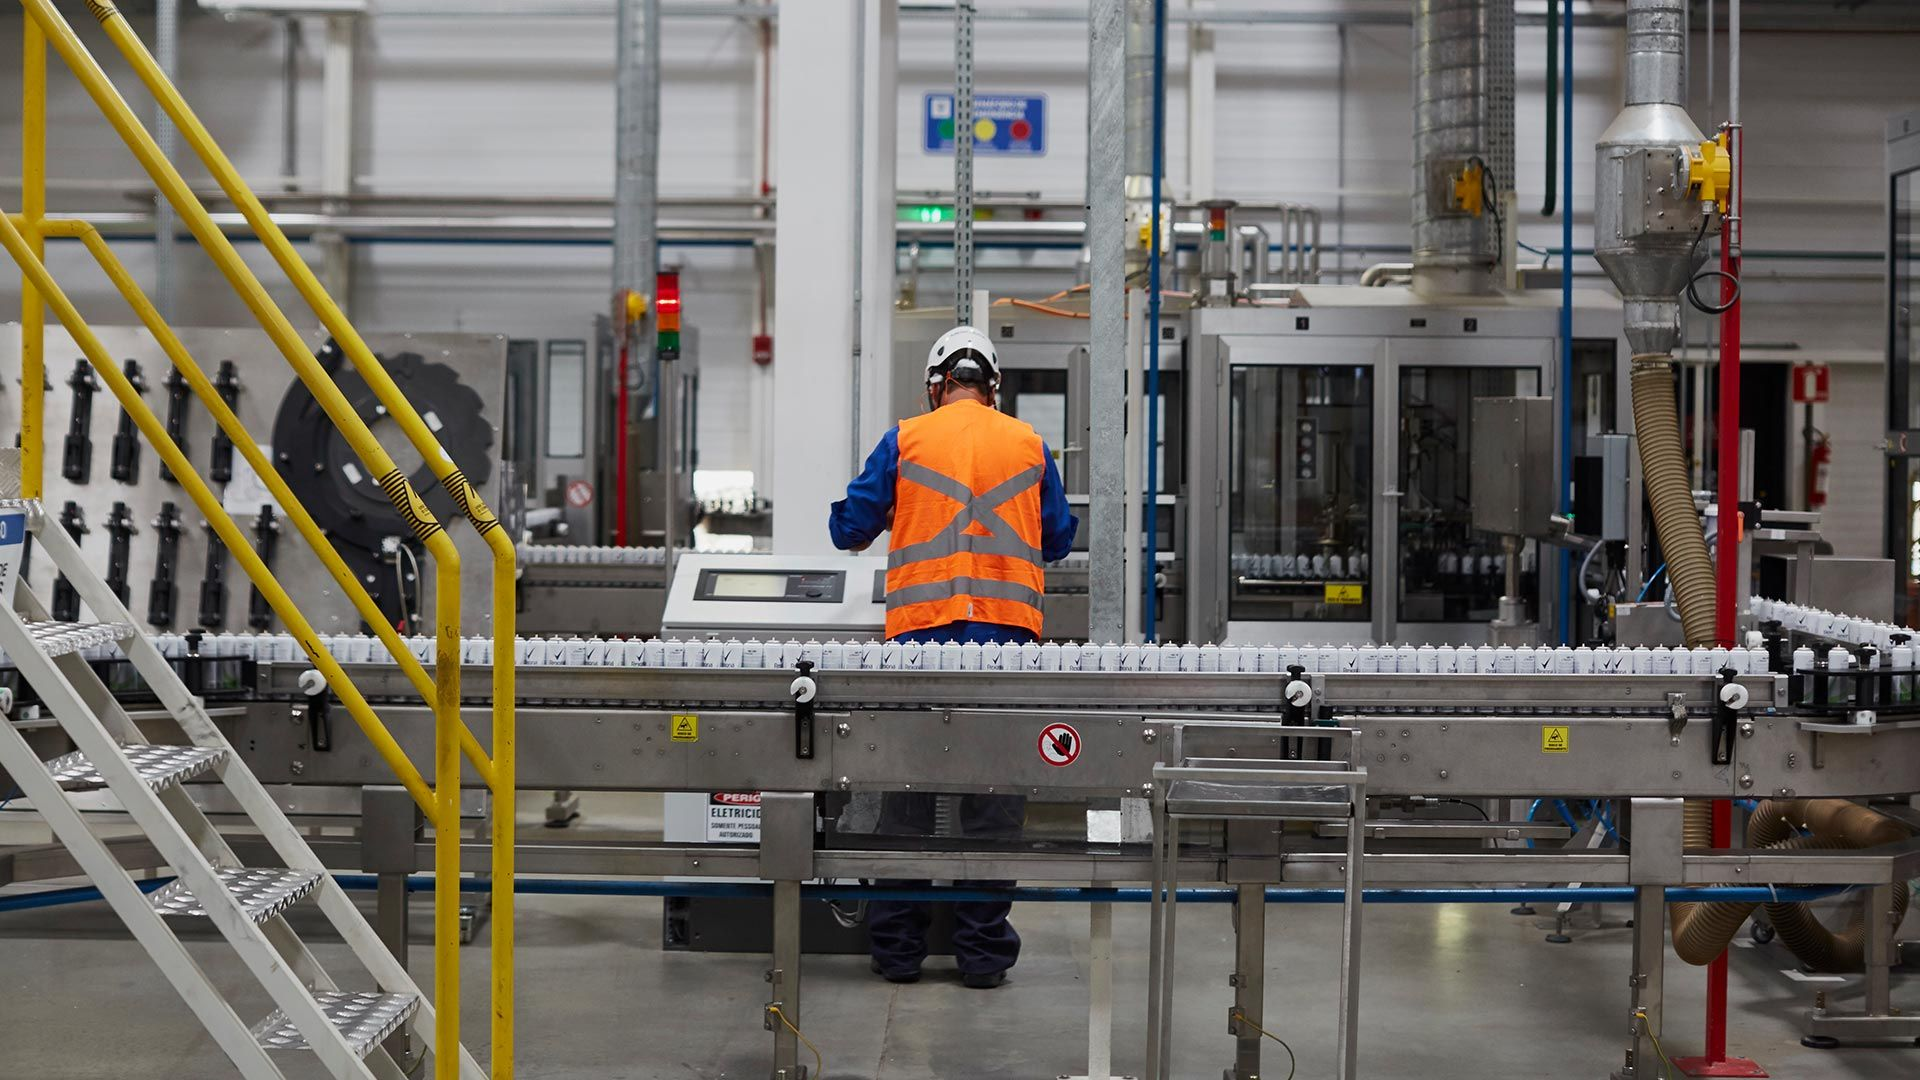 Working in Unilever factory